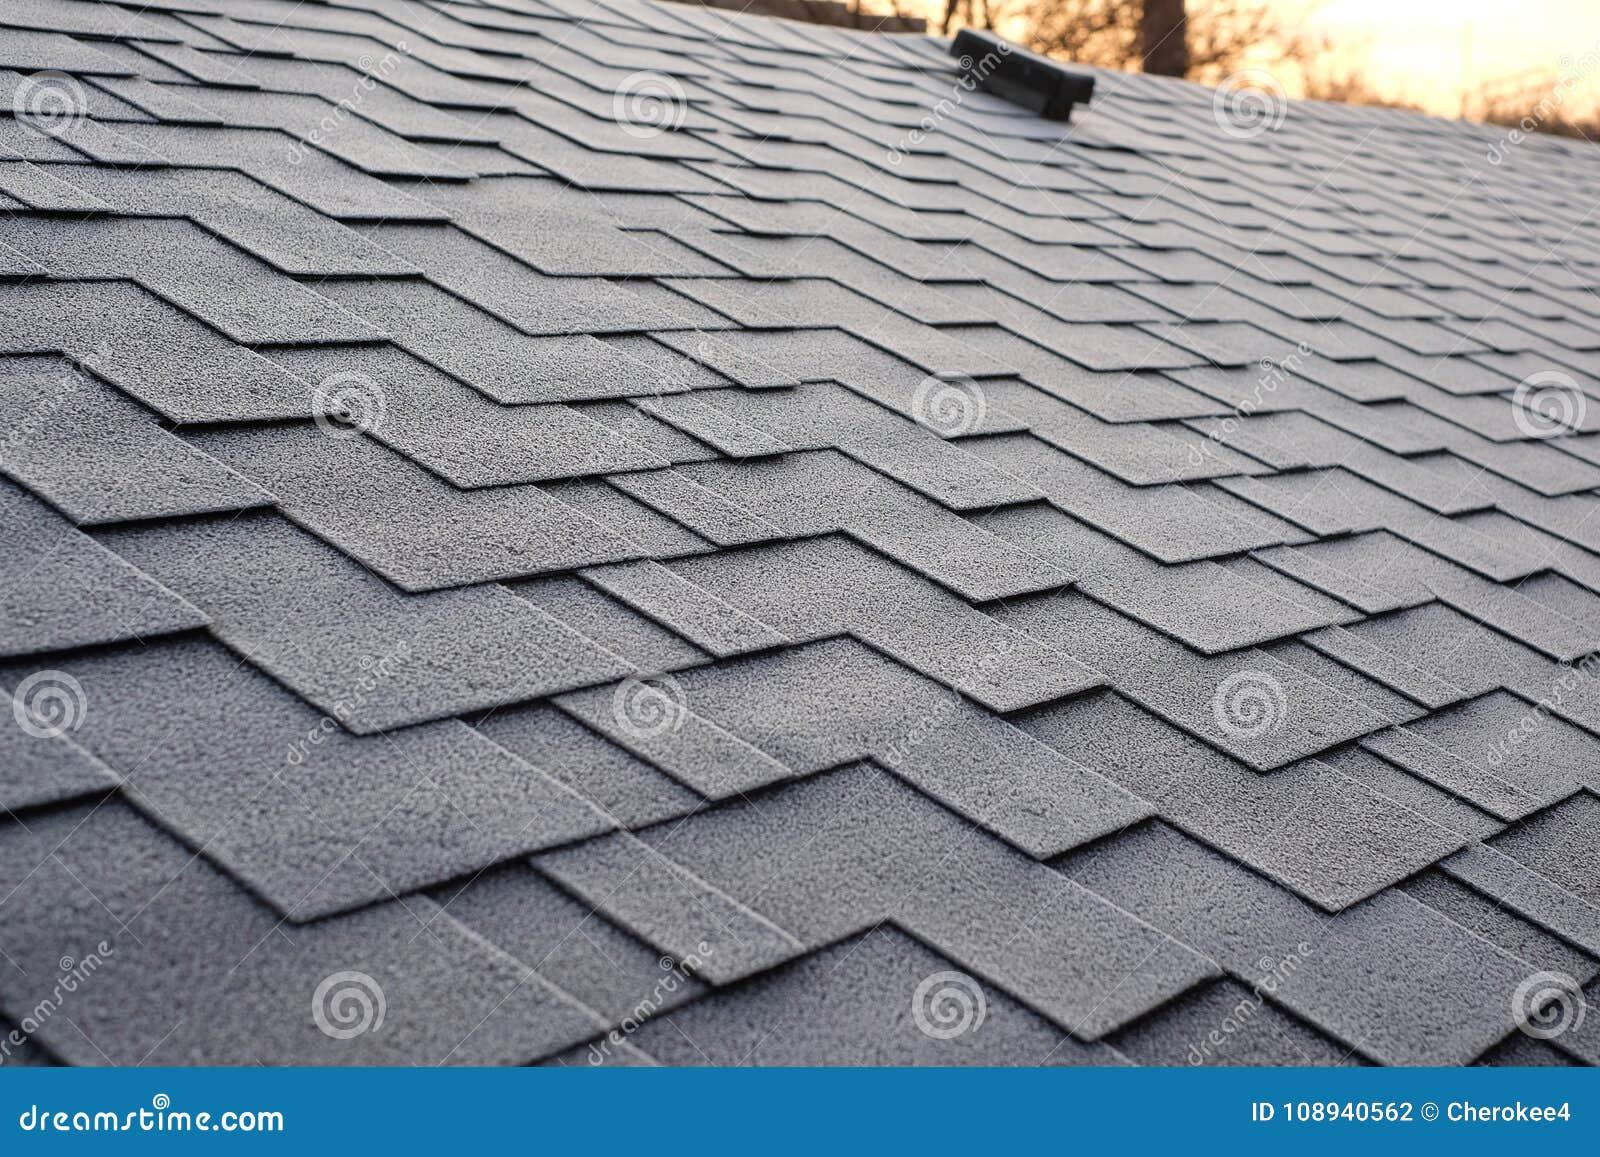 Sluit omhoog mening over Asphalt Roofing Shingles Background Dakdakspanen - Dakwerk De schade van het dakspanendak met vorst word